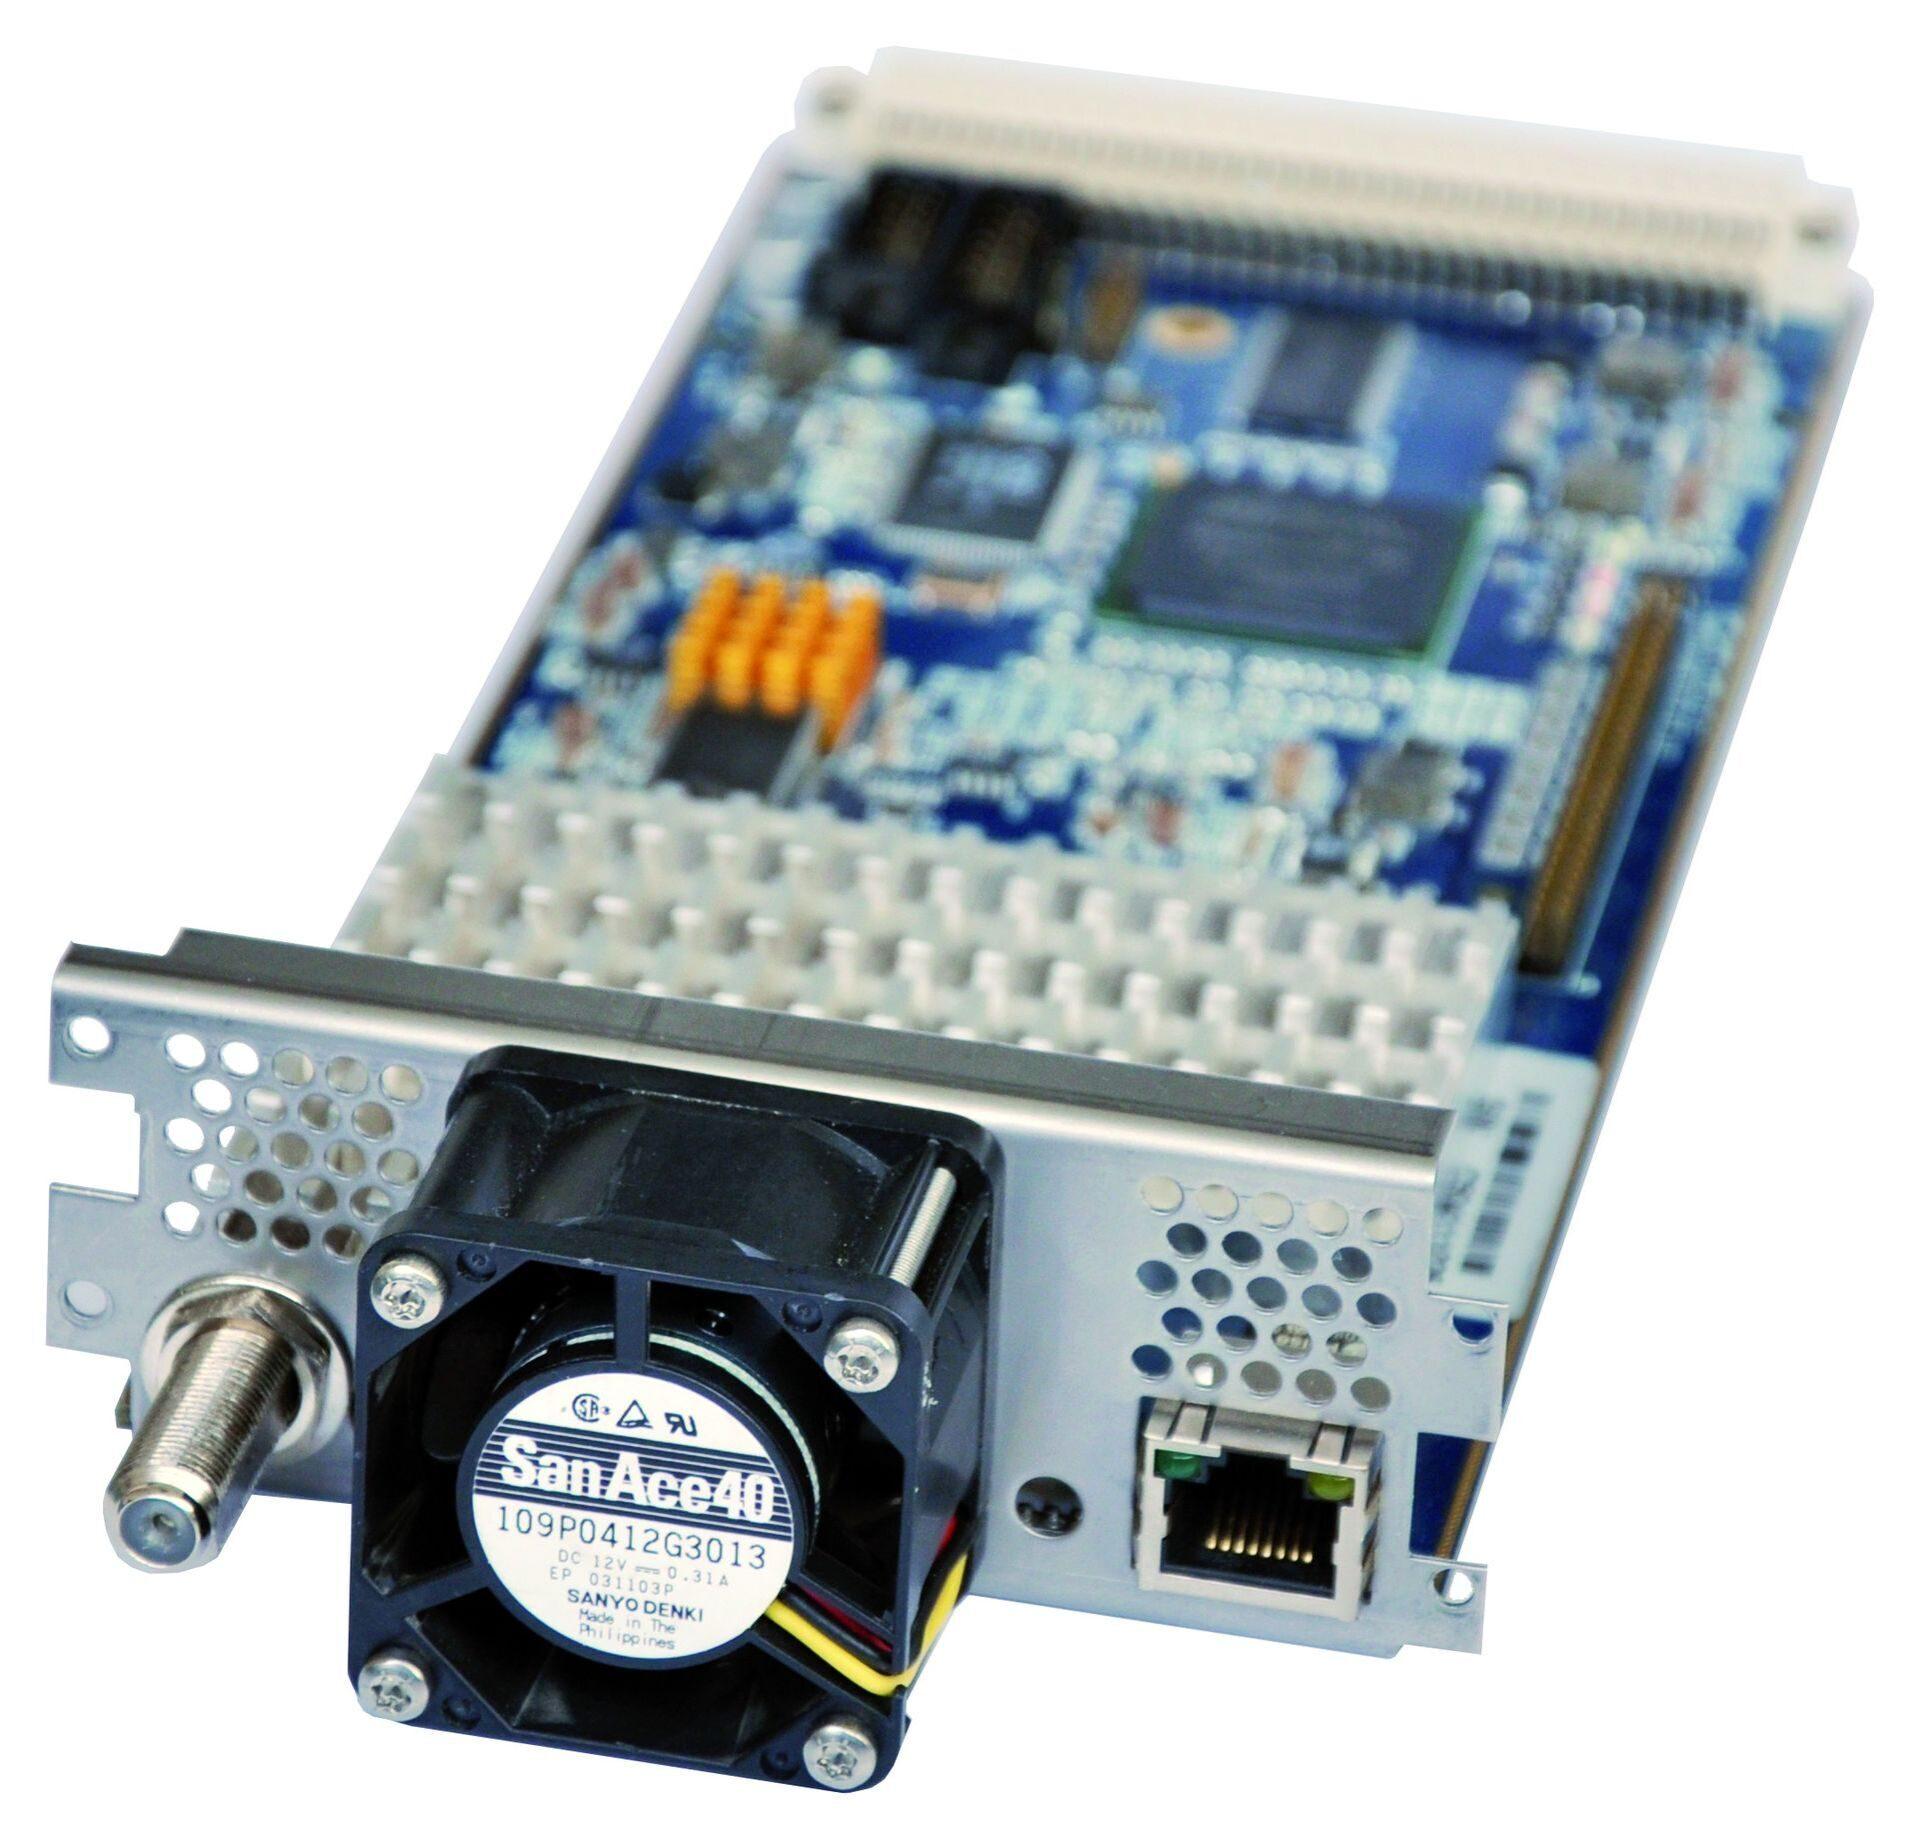 TO – карта COFDM (DVB-T) модулятора до 4 не смежных частот